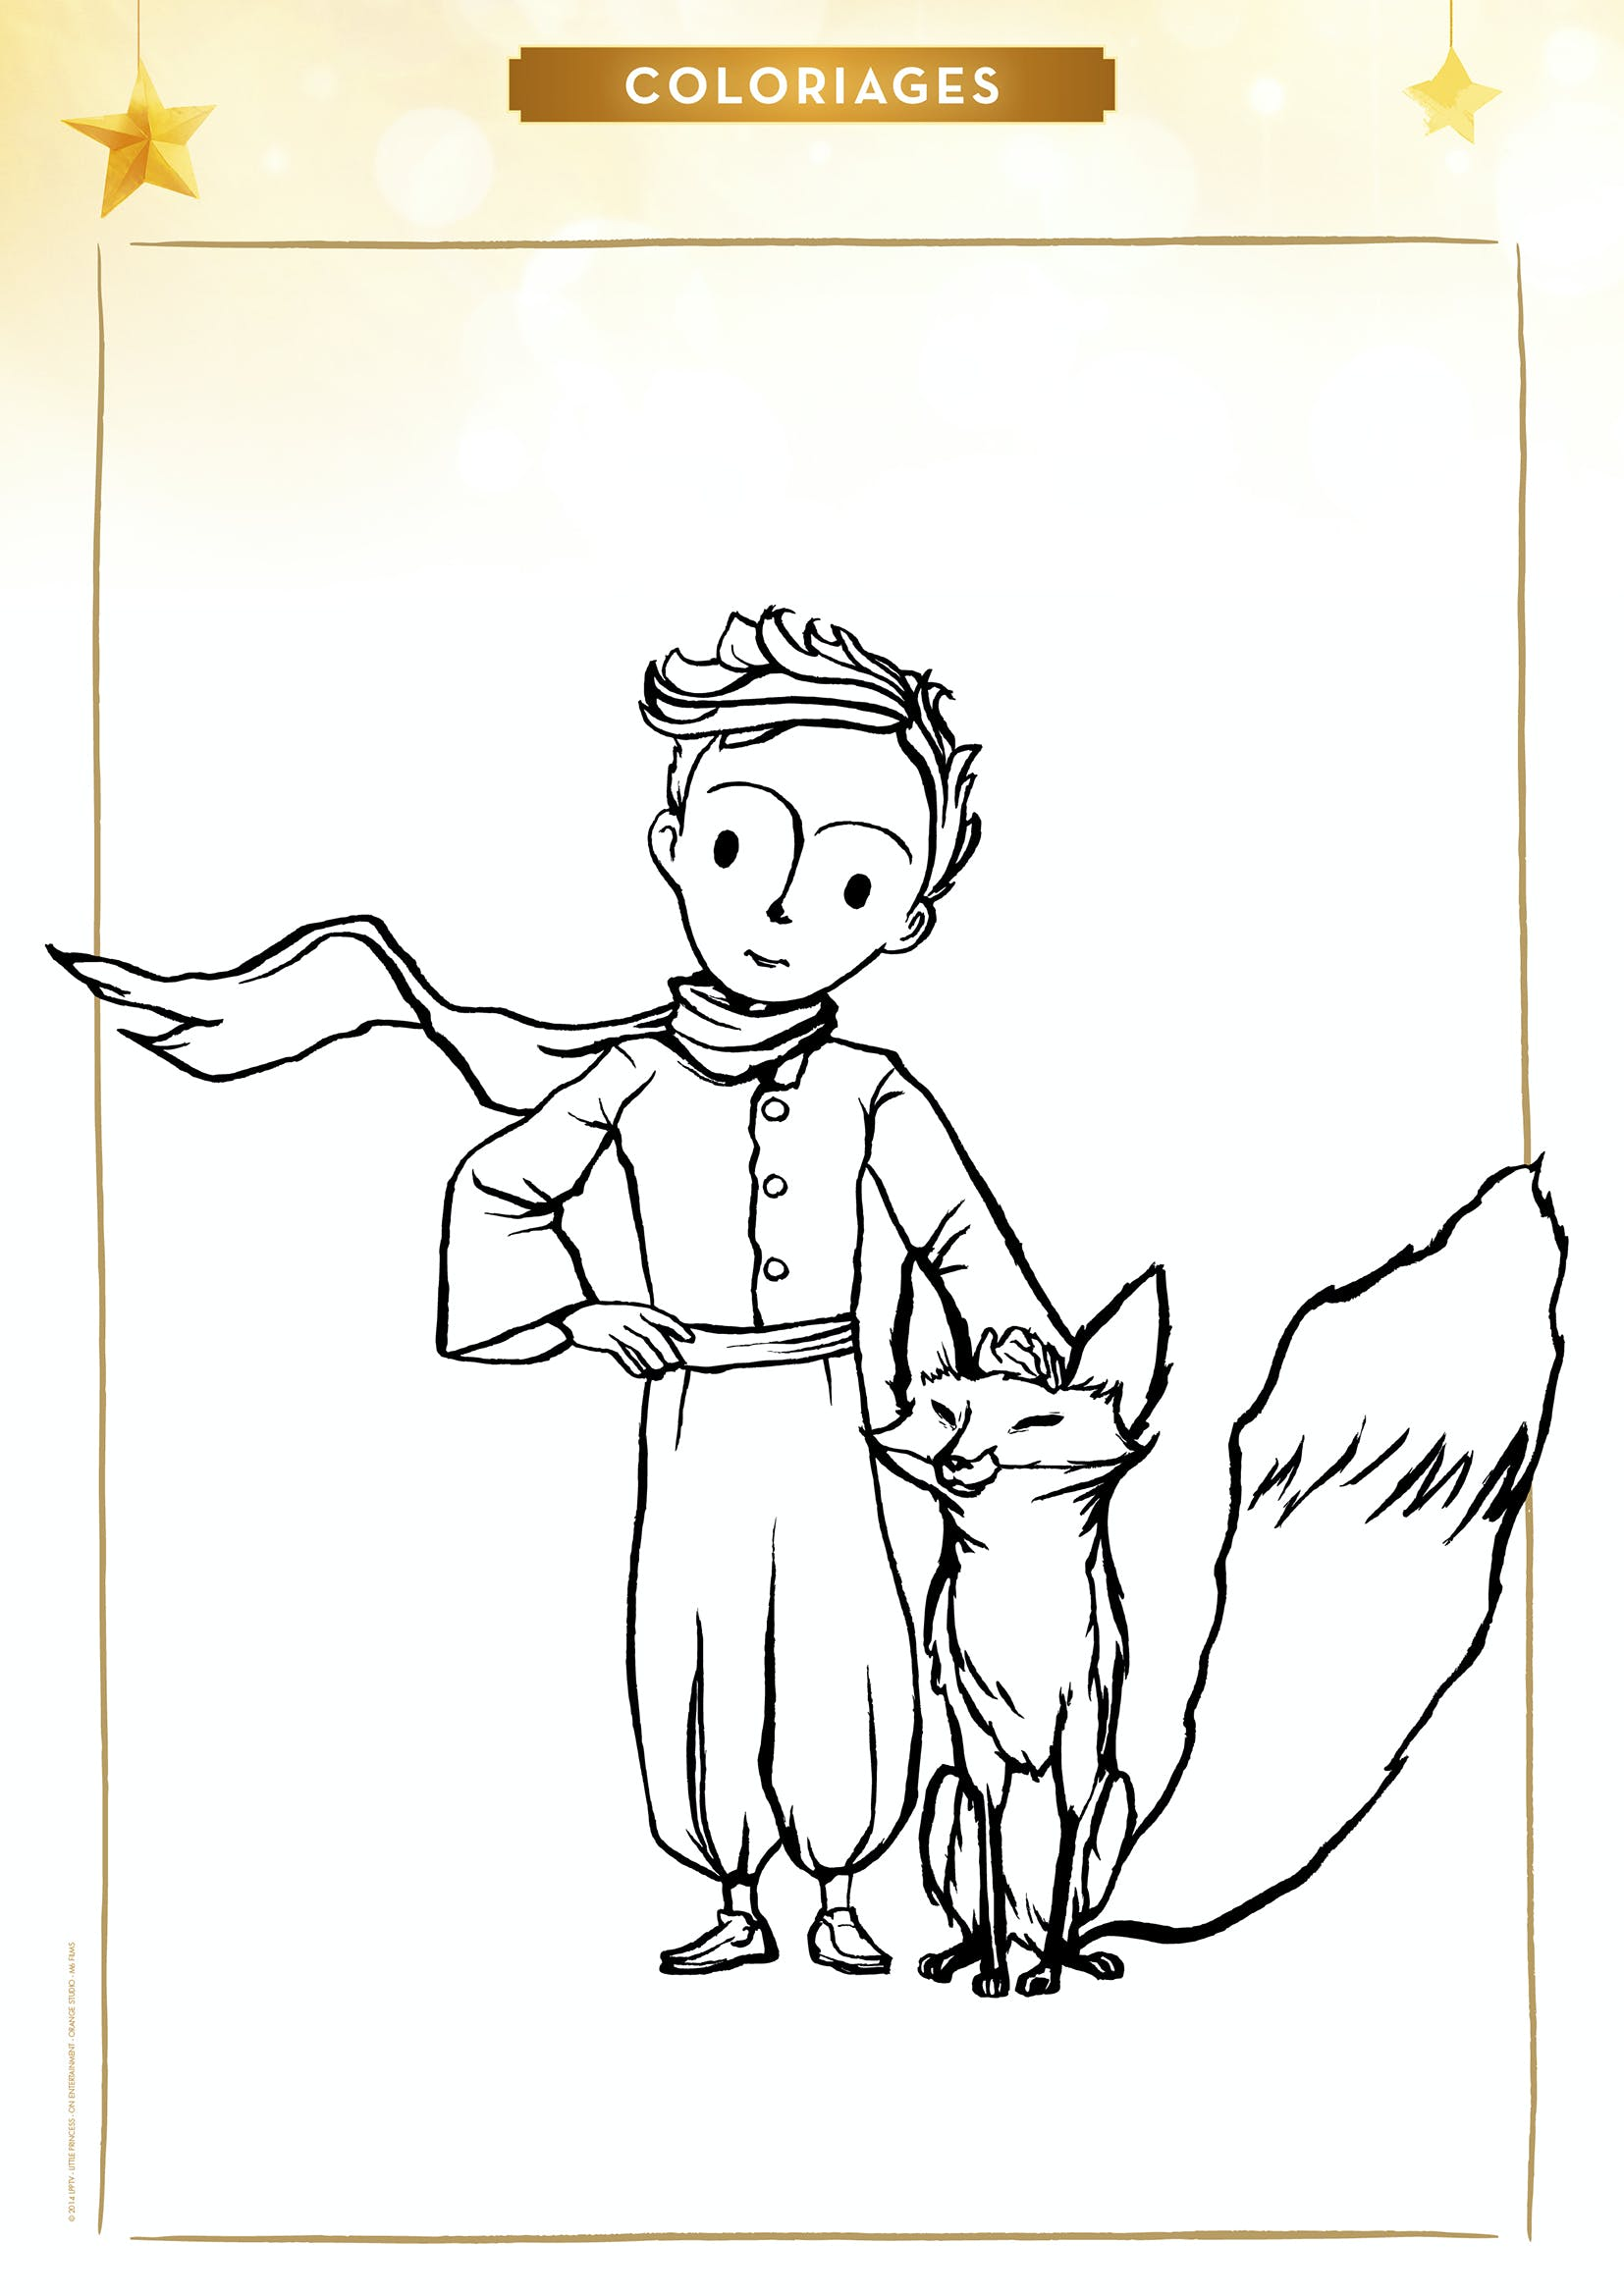 Meilleur de image renard a imprimer gratuit - Coloriage petit renard ...